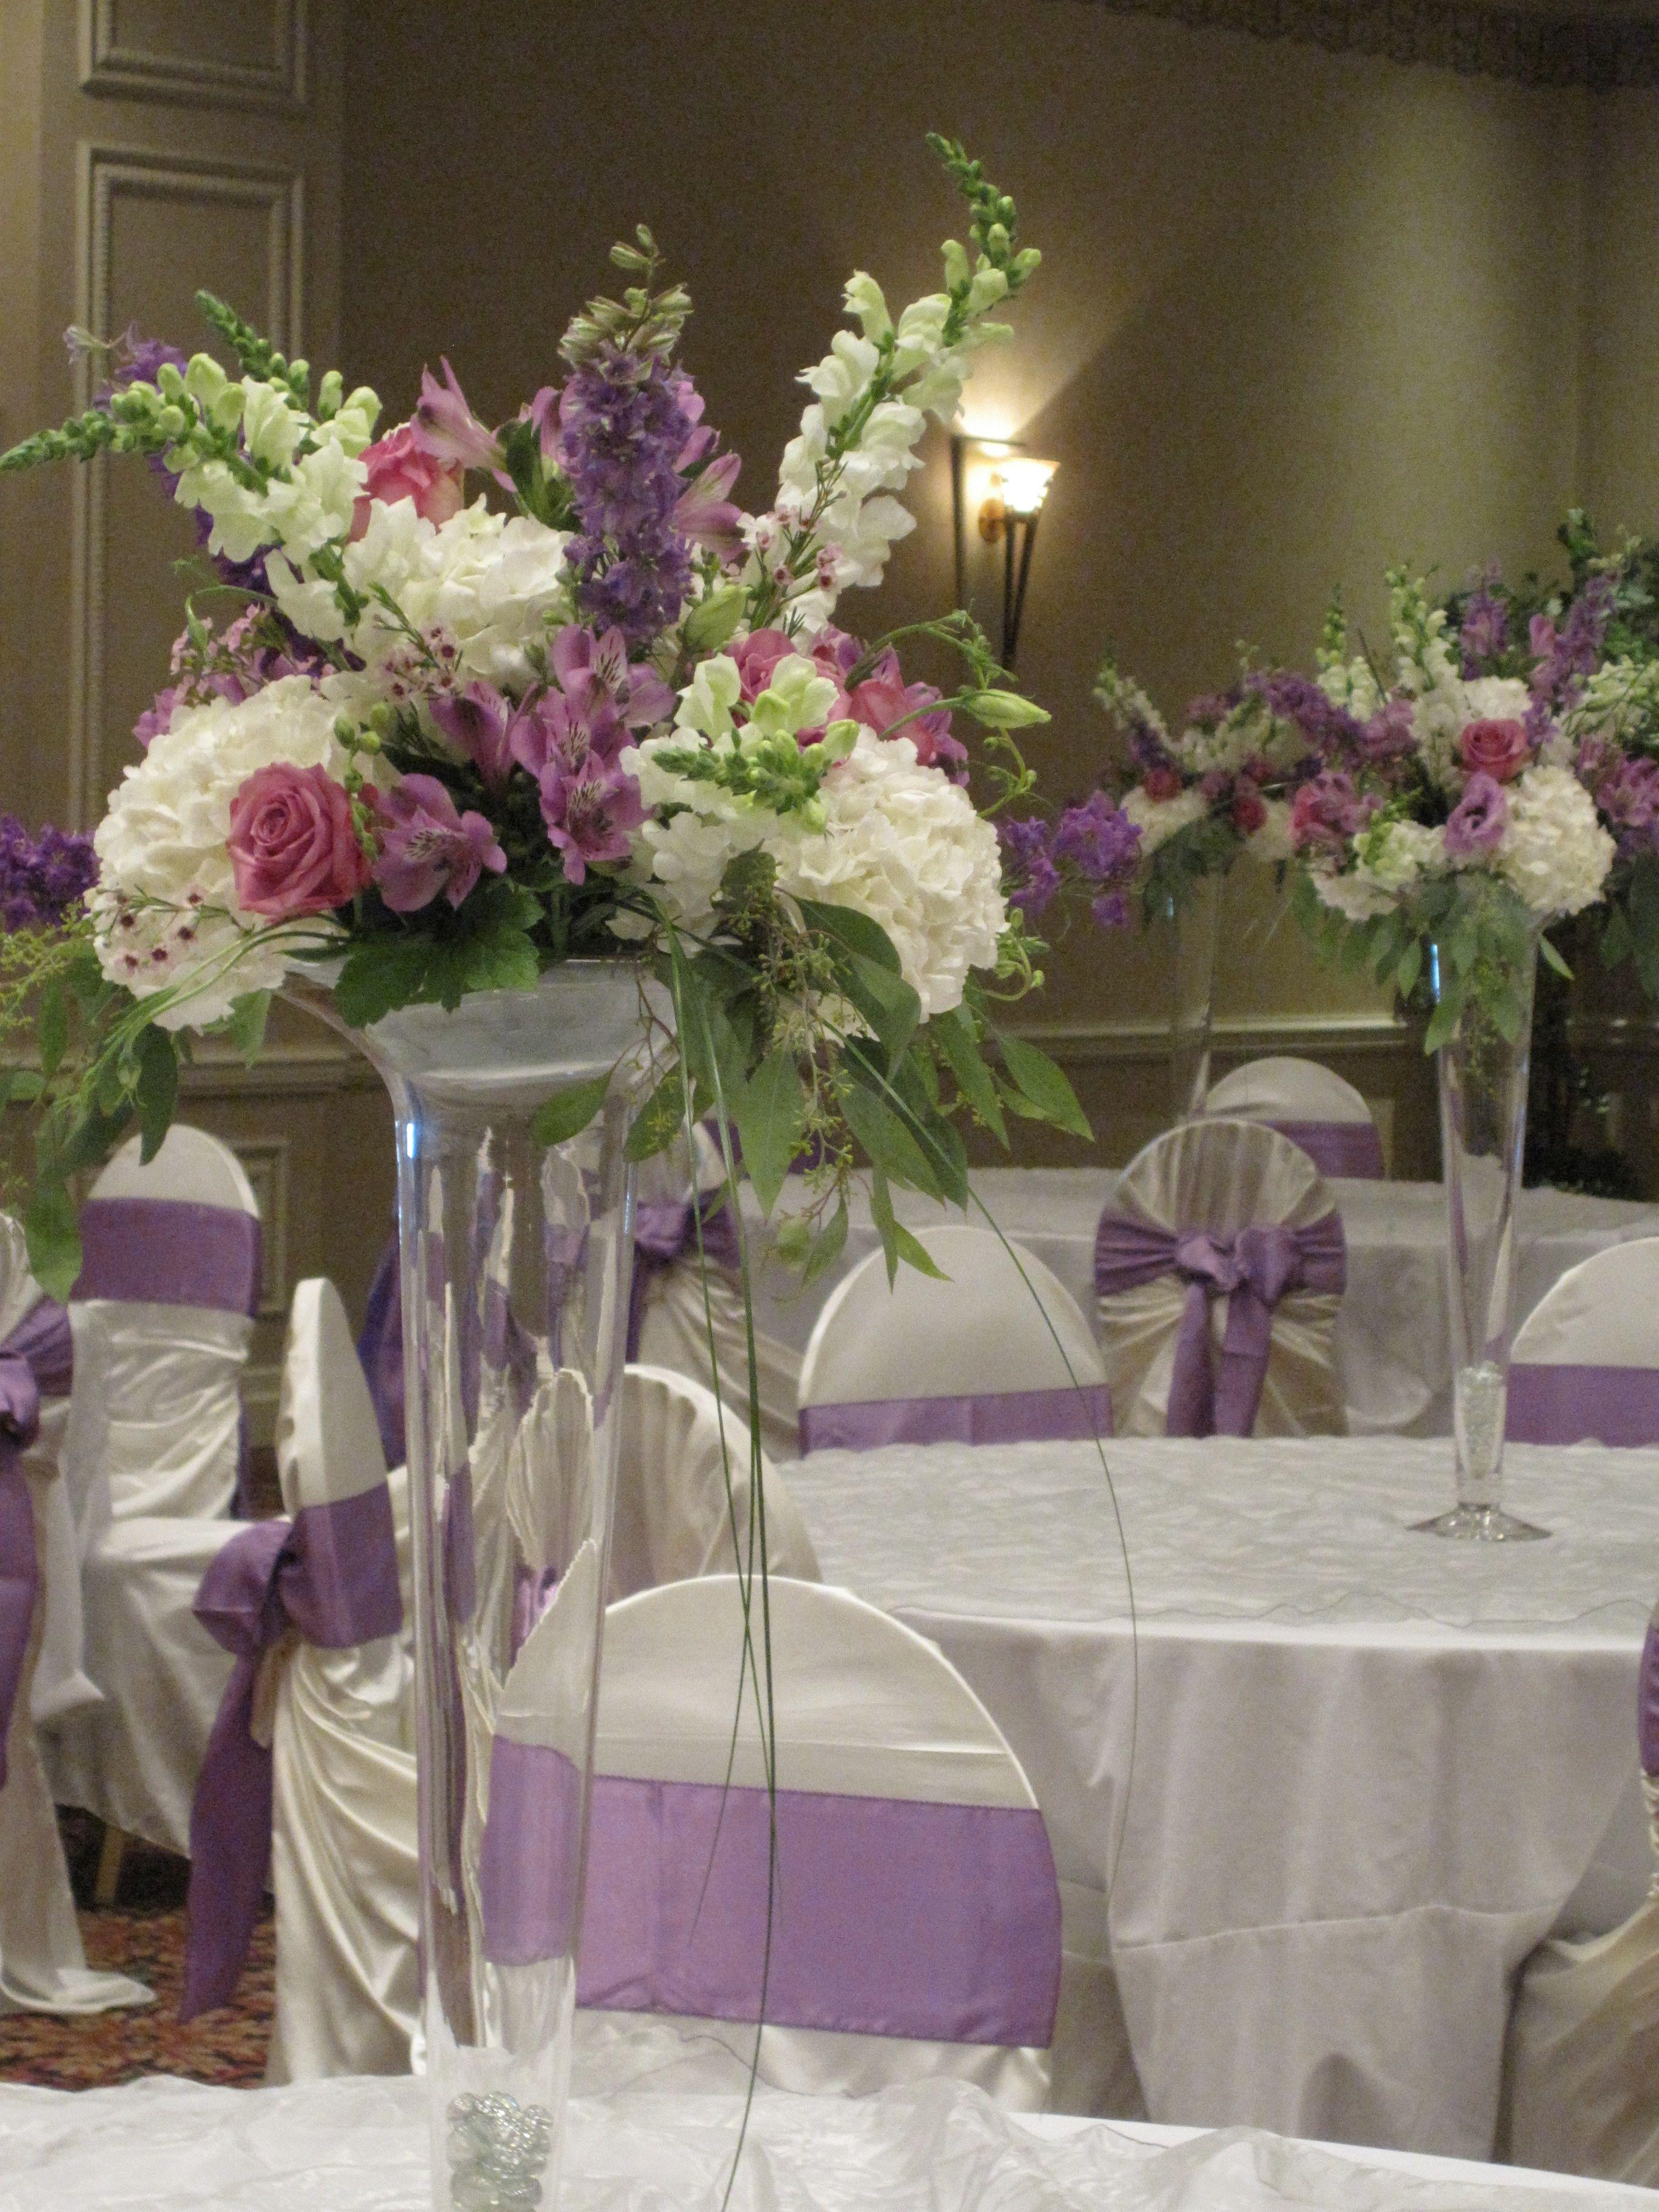 Trumpet vase centerpieces in lavender and white with hydrangea trumpet vase centerpieces in lavender and white with hydrangea snapdragons roses larkspur reviewsmspy